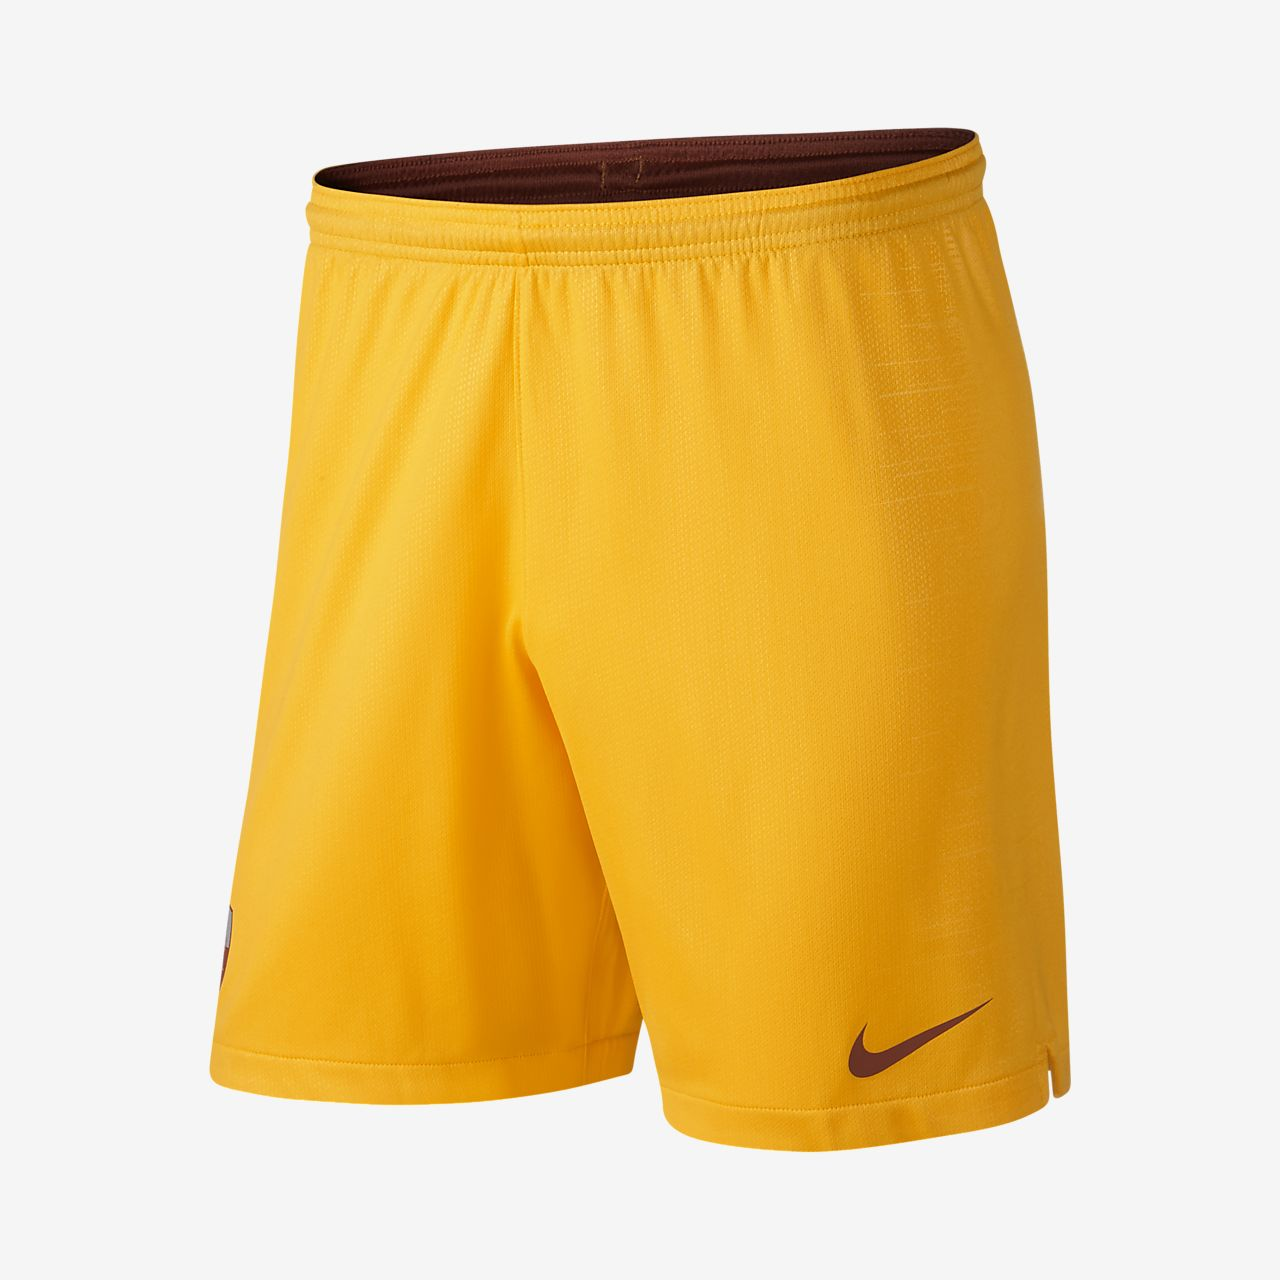 2018/19 A.S. Roma Stadium Third Men's Football Shorts